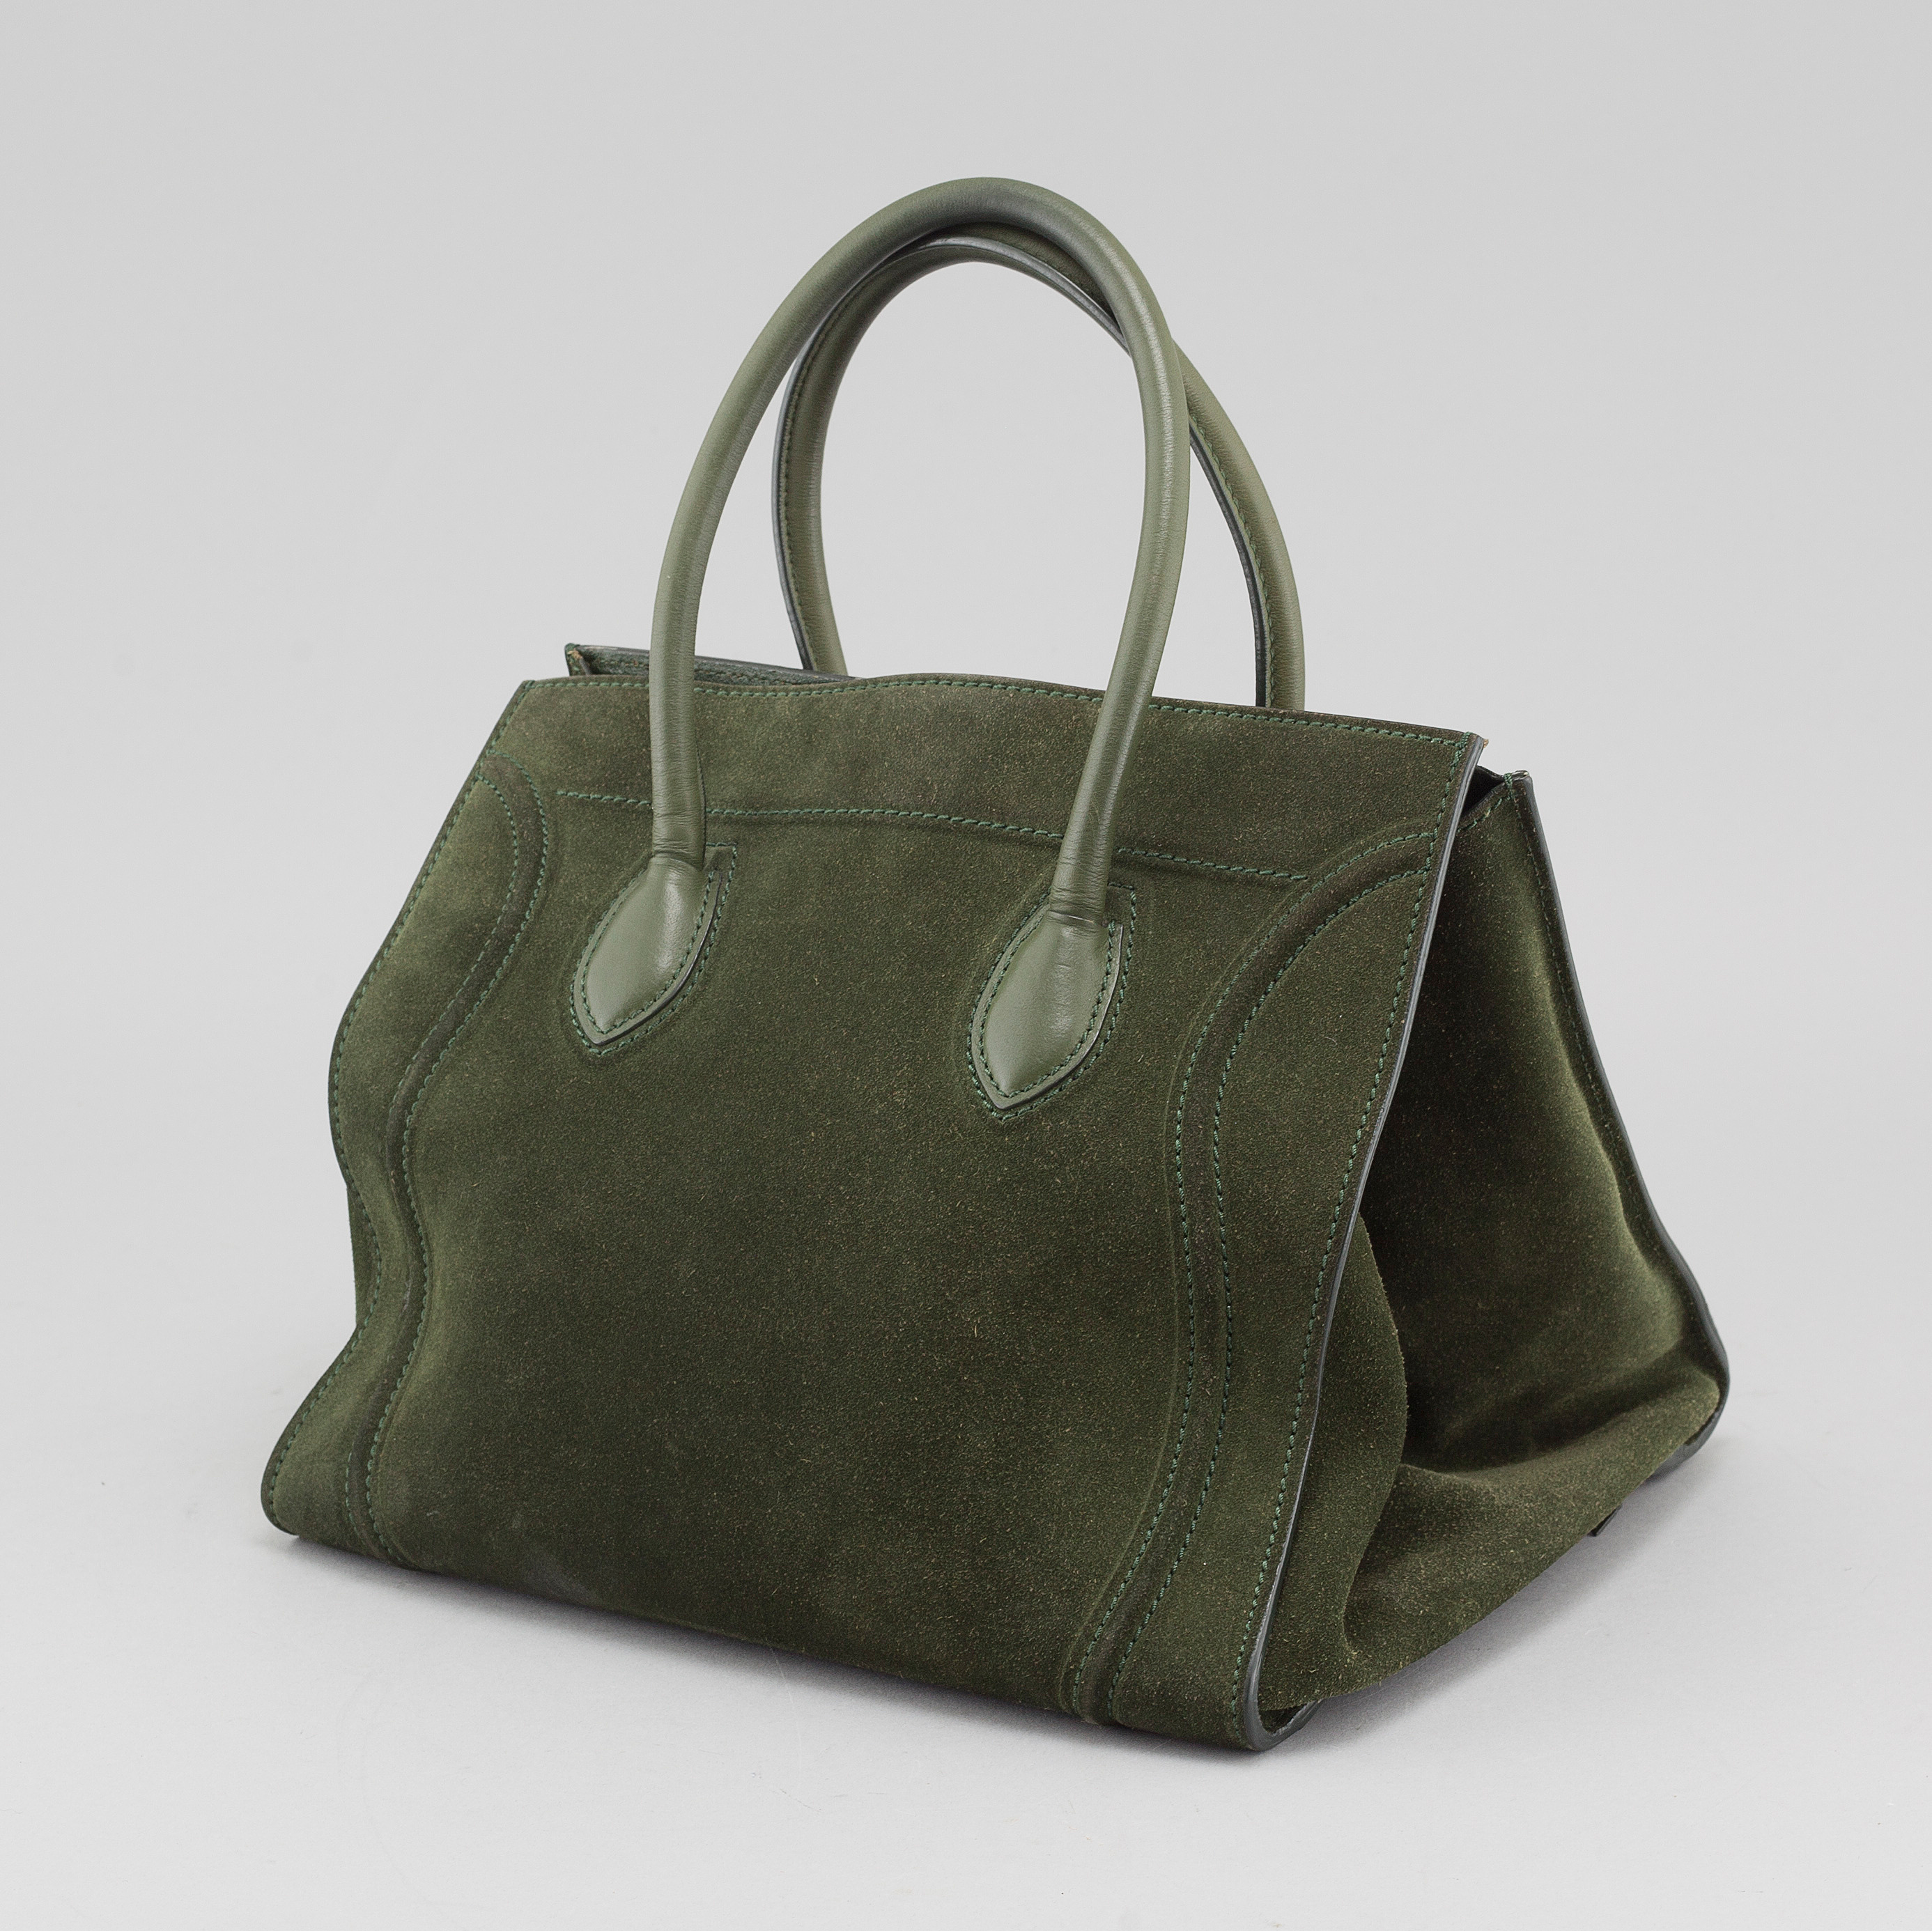 61cda3377 CÉLINE, A Dark Green Medium Phantom Tote bag. - Bukowskis